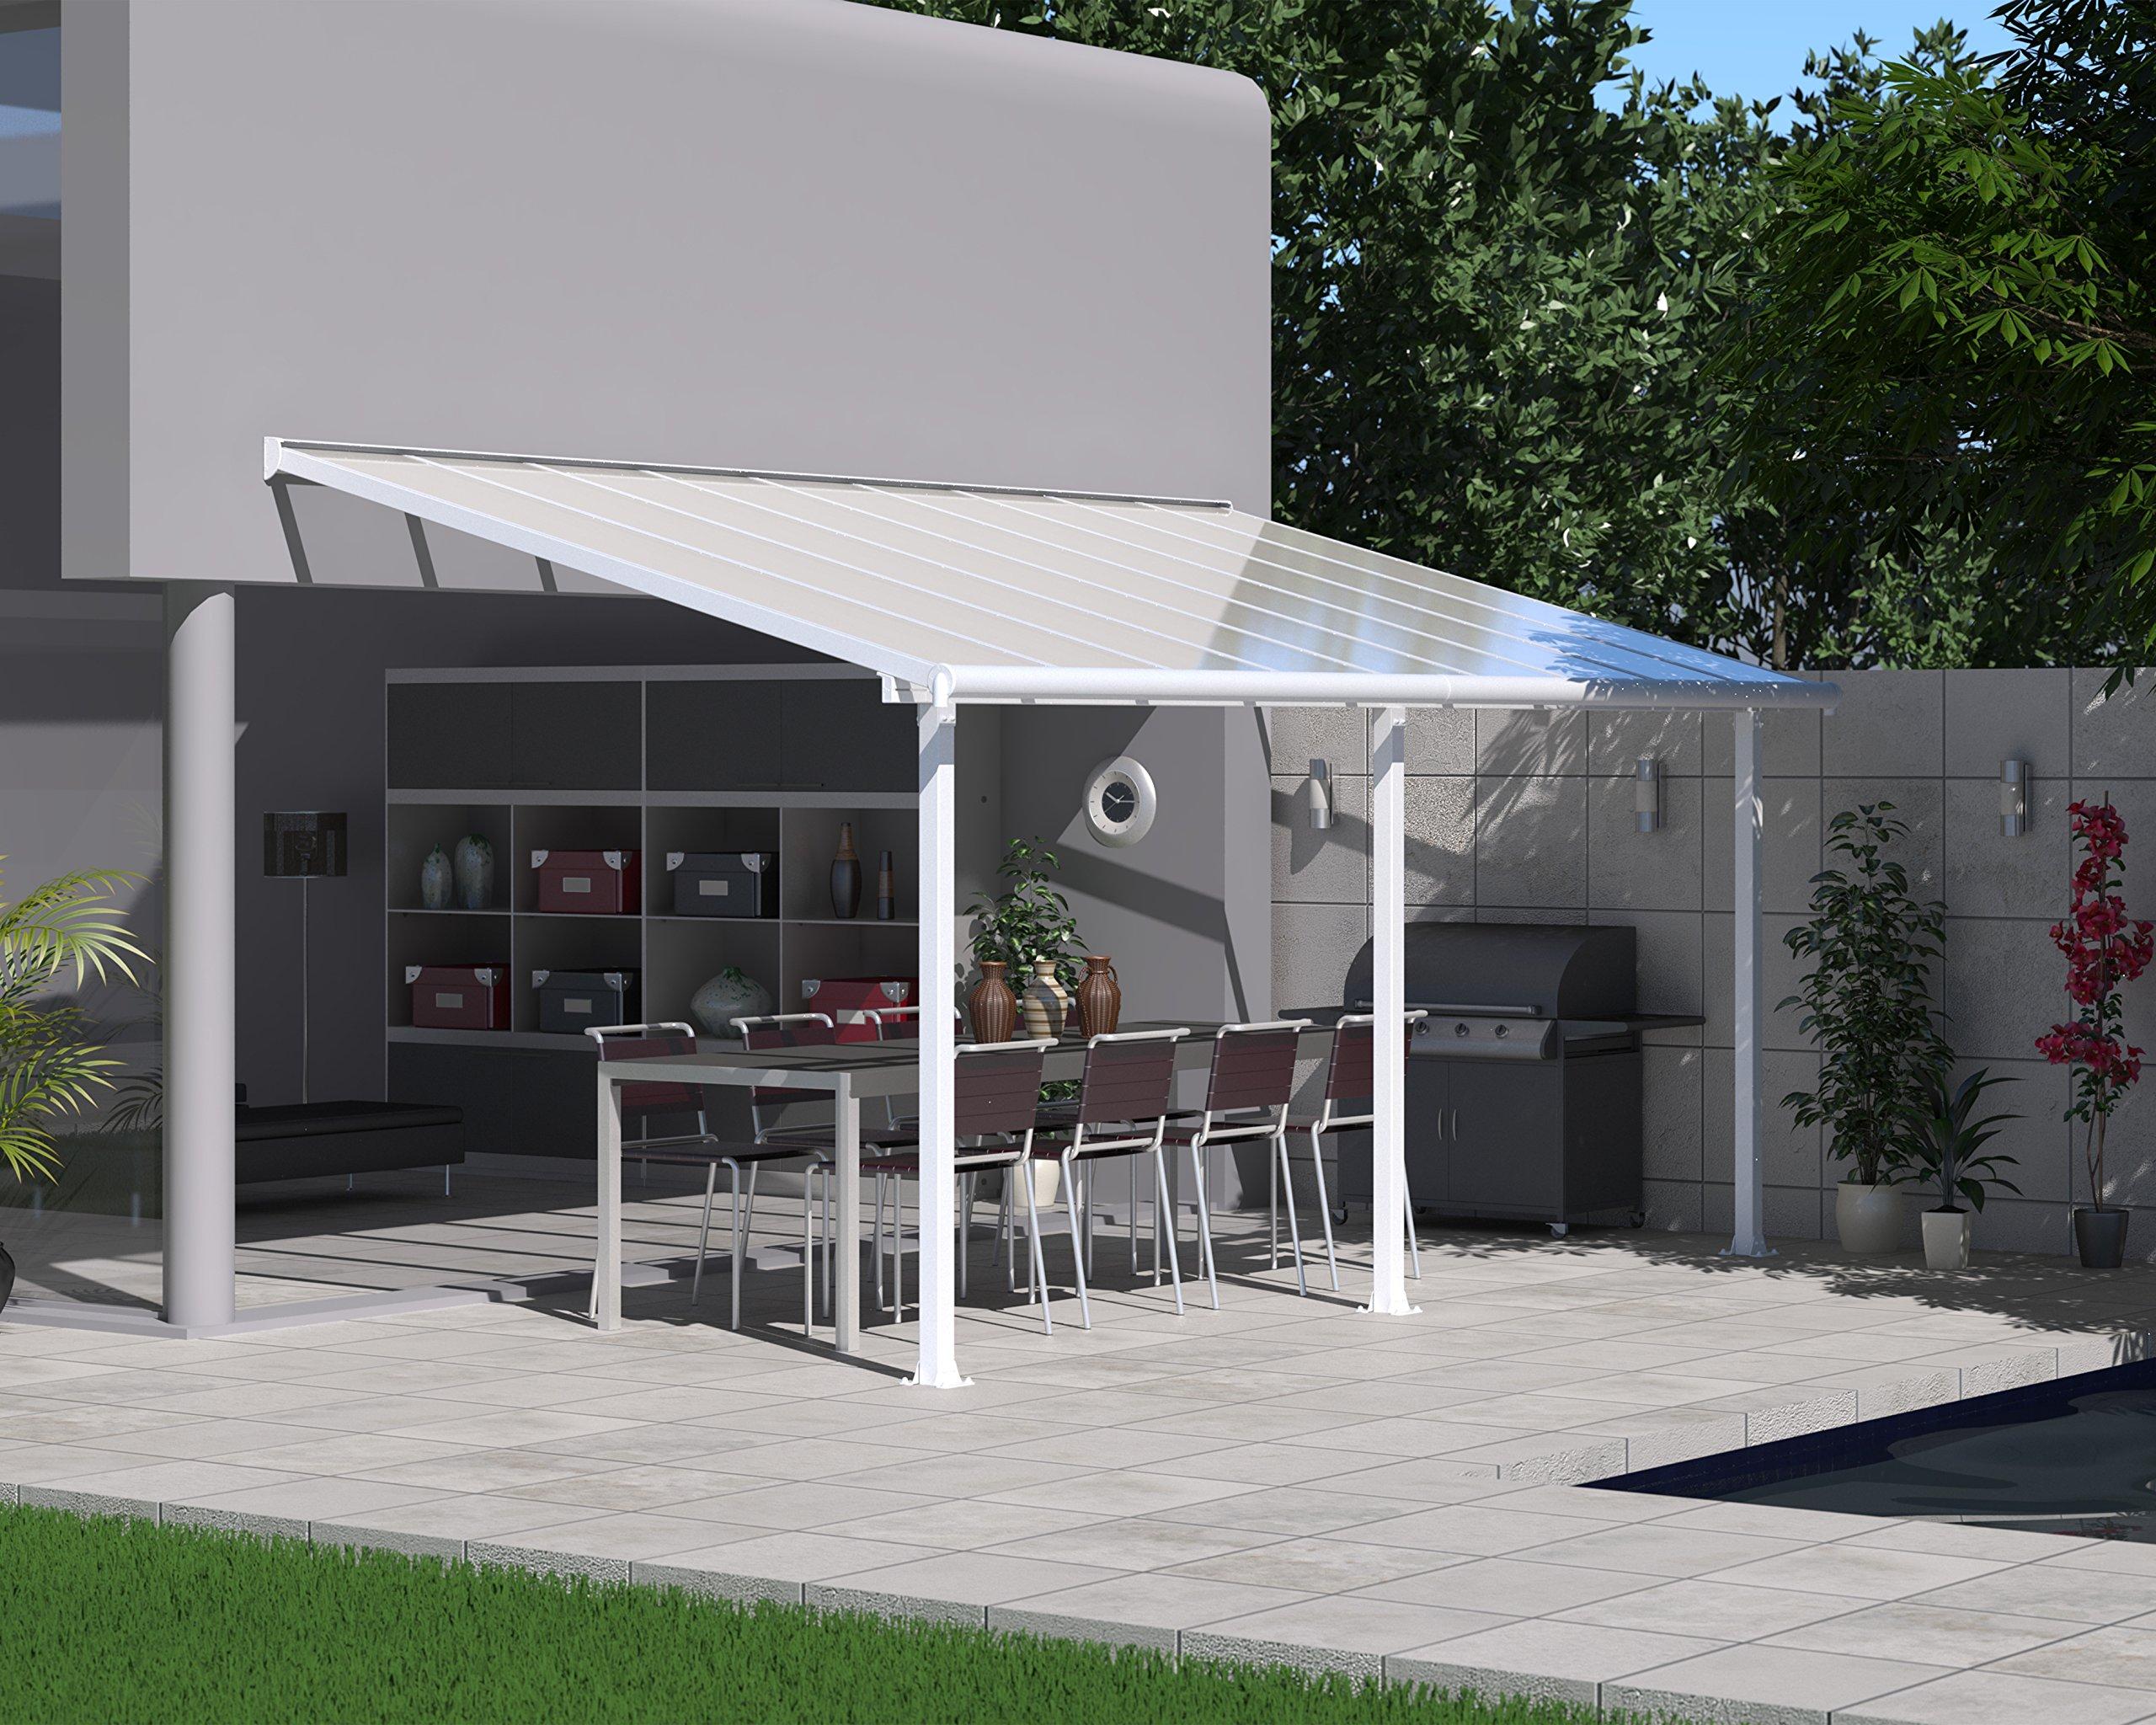 Palram Olympia Cubierta para terrazas, Blanco, 546x295x305 cm: Amazon.es: Jardín